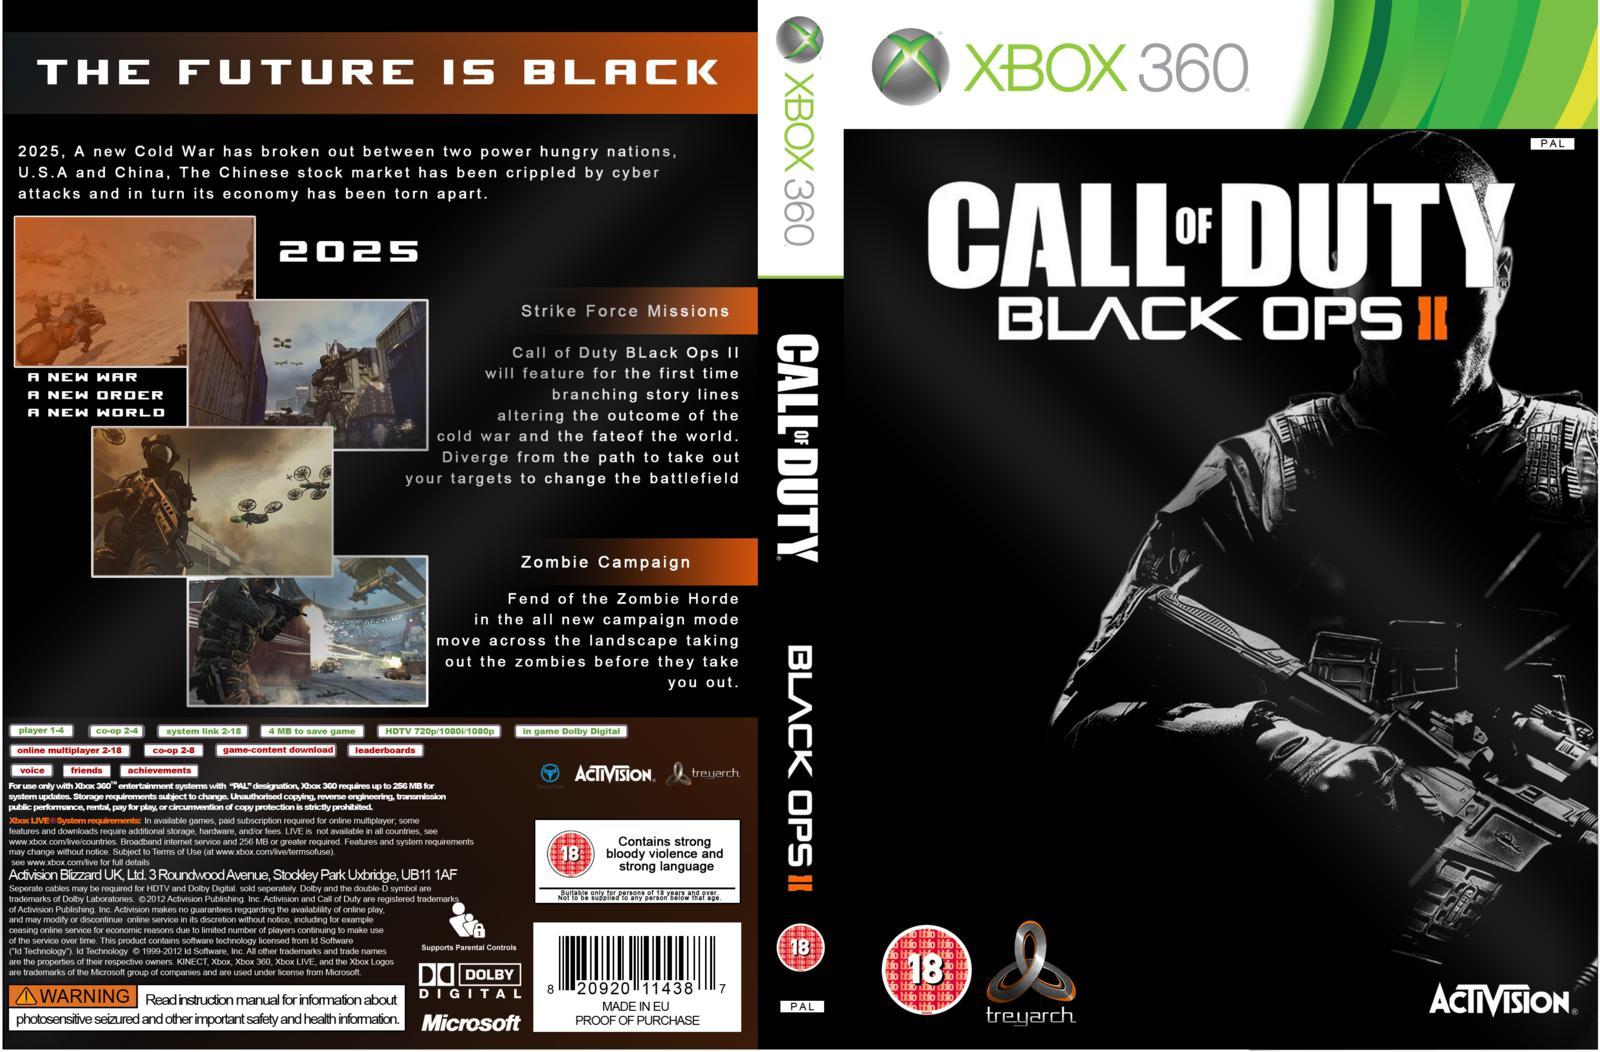 Почему нет звука в игре call of duty black ops 2